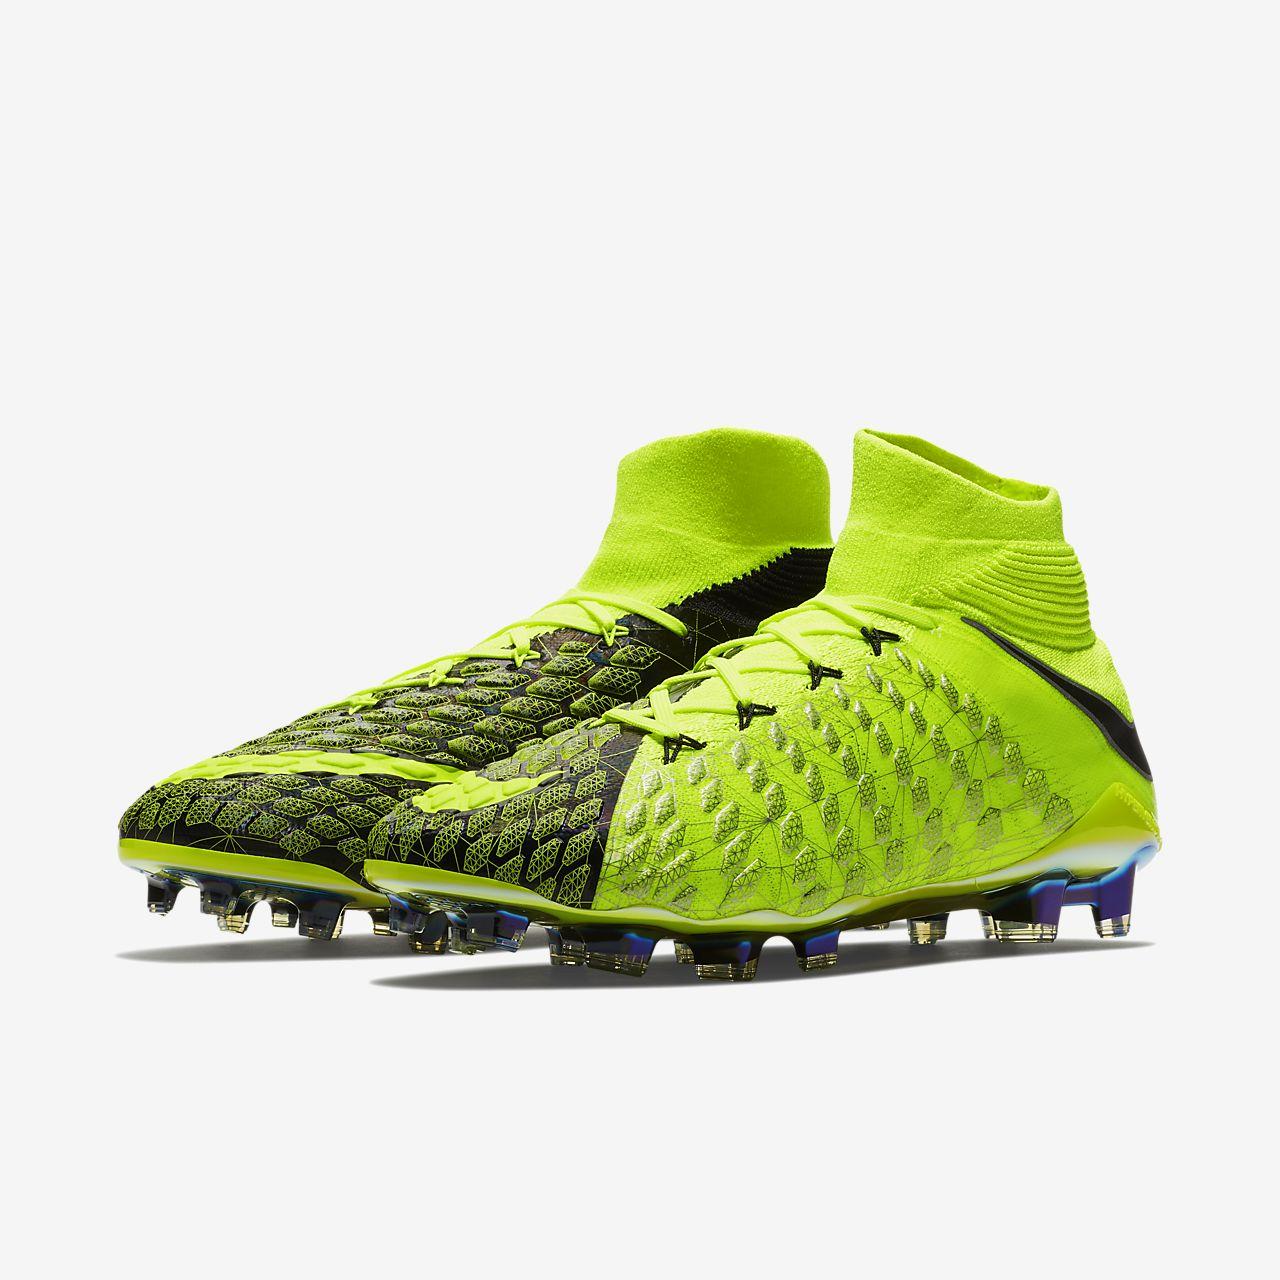 Nike x EA Sports Hypervenom Phantom 3 DF SE FG Firm-Ground